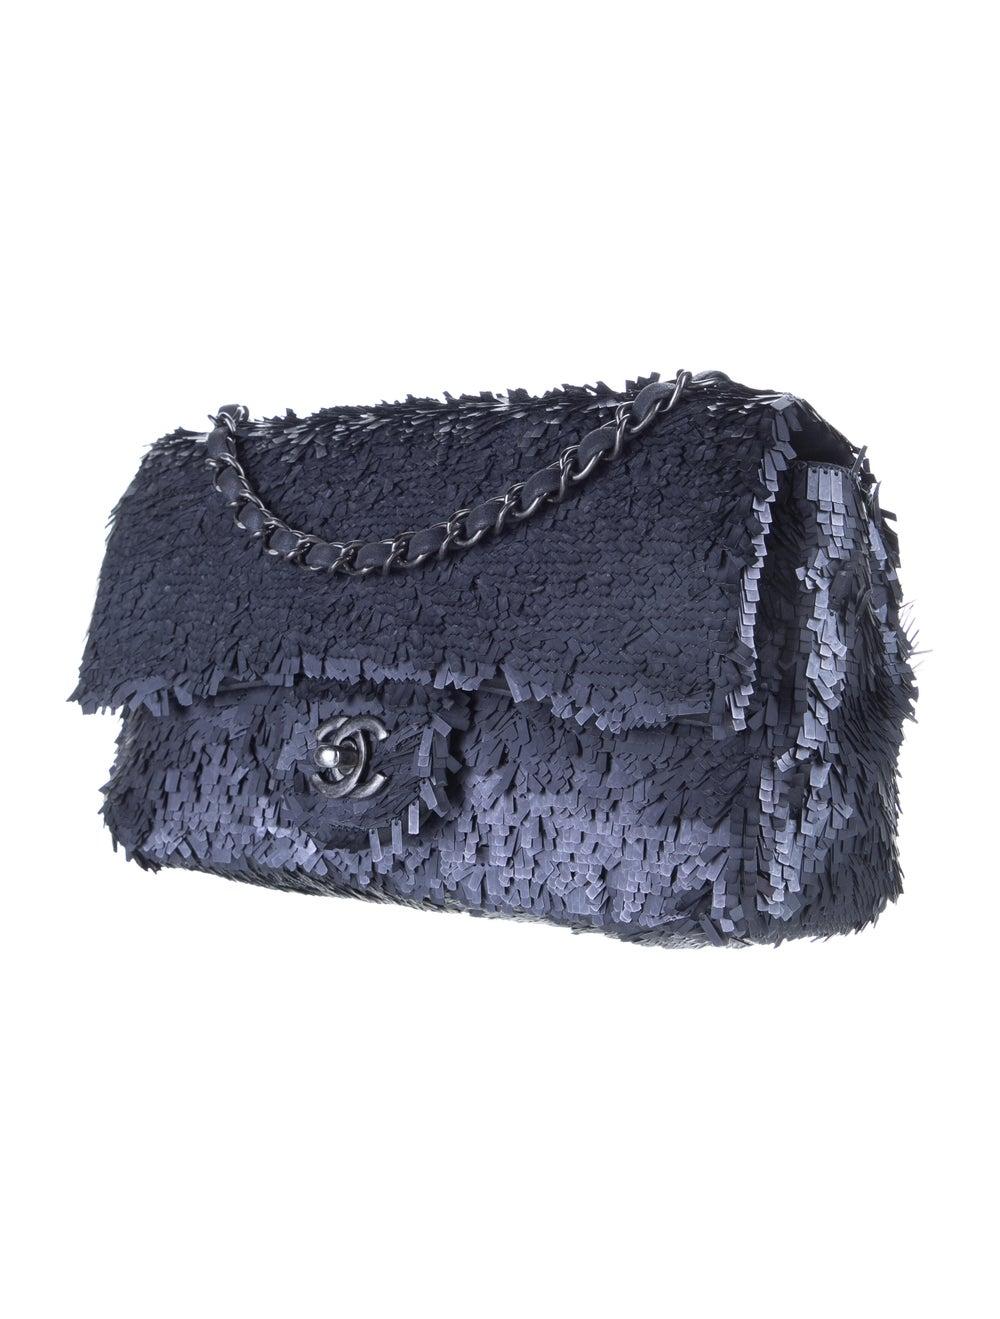 Chanel Sequin Flap Bag Blue - image 3